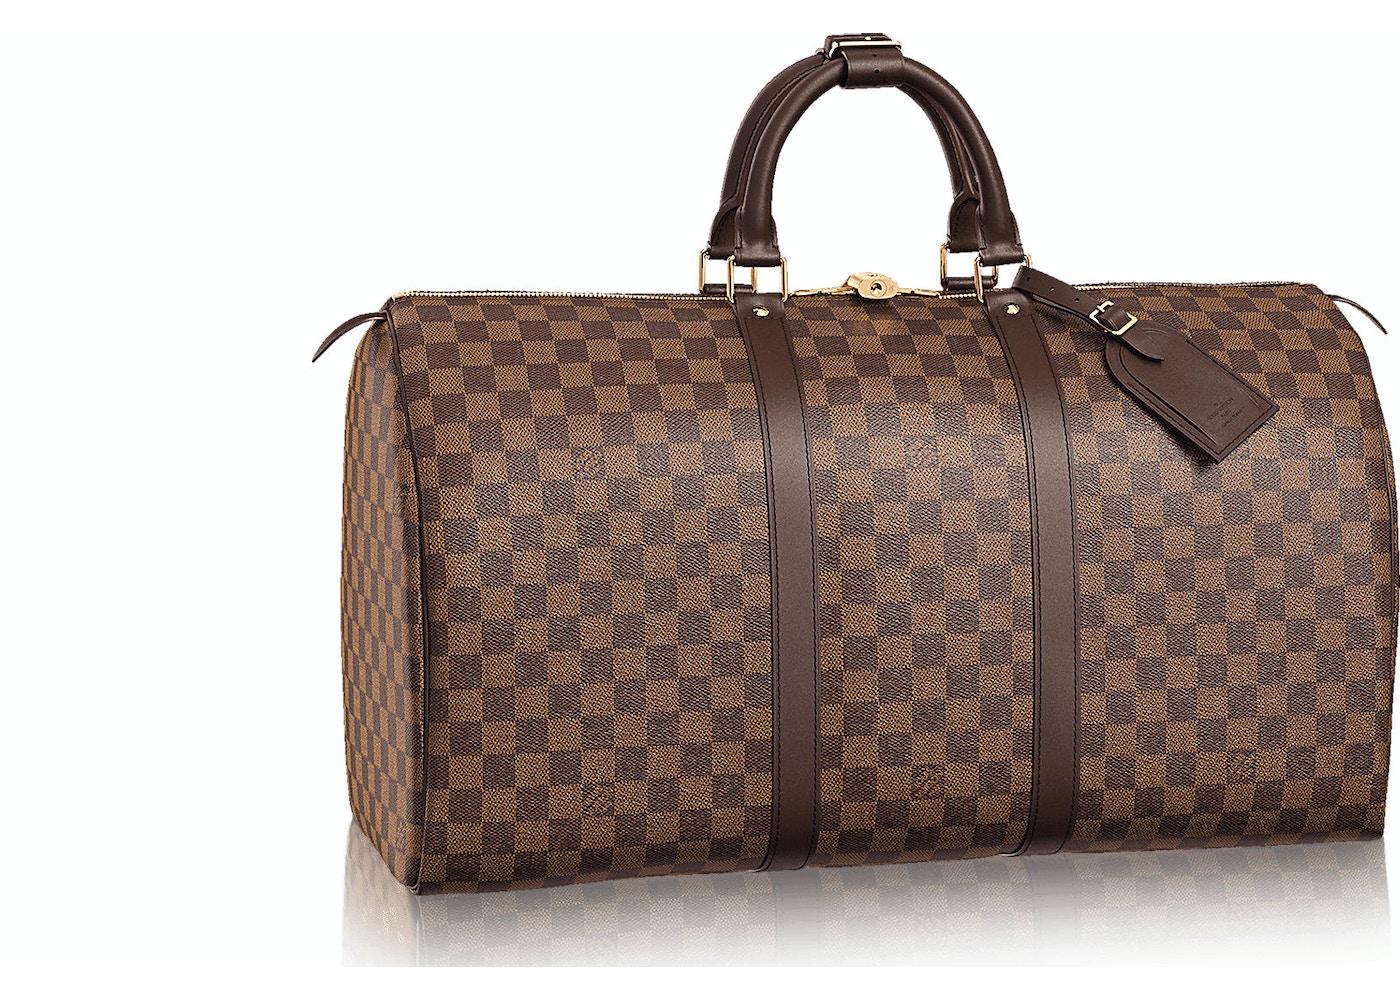 6da0ba4f9e5 Louis Vuitton Keepall Damier Ebene (With Accessories) 50 Brown